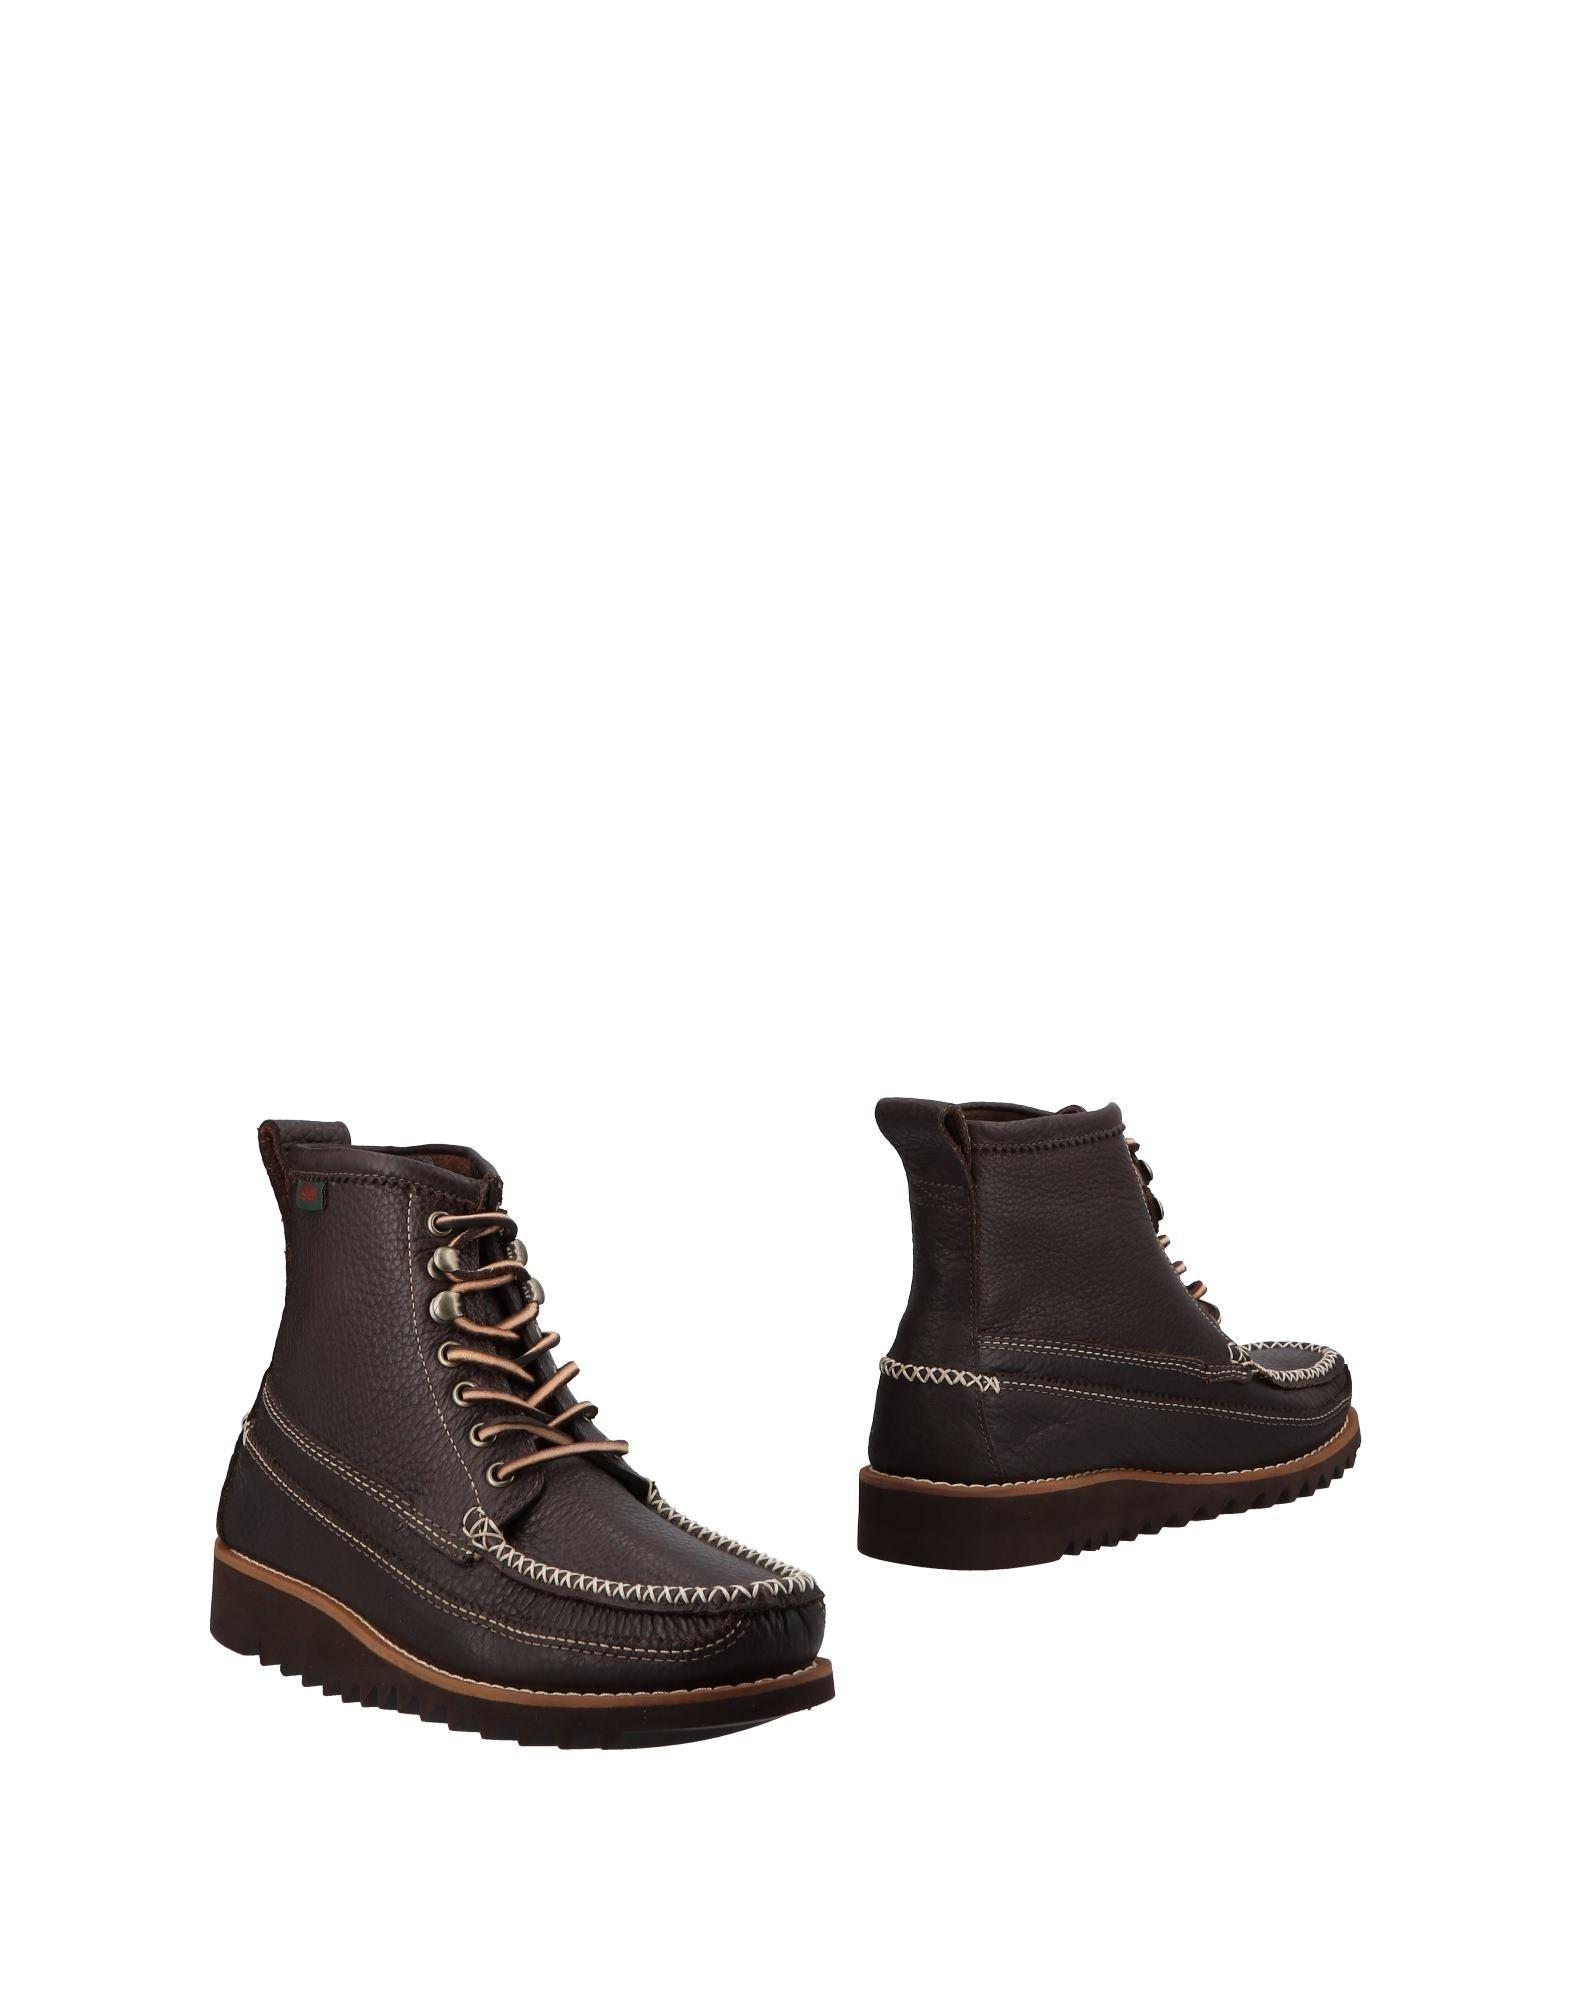 Rabatt echte Schuhe G.H. Bass & Co Stiefelette Herren  11276917LK